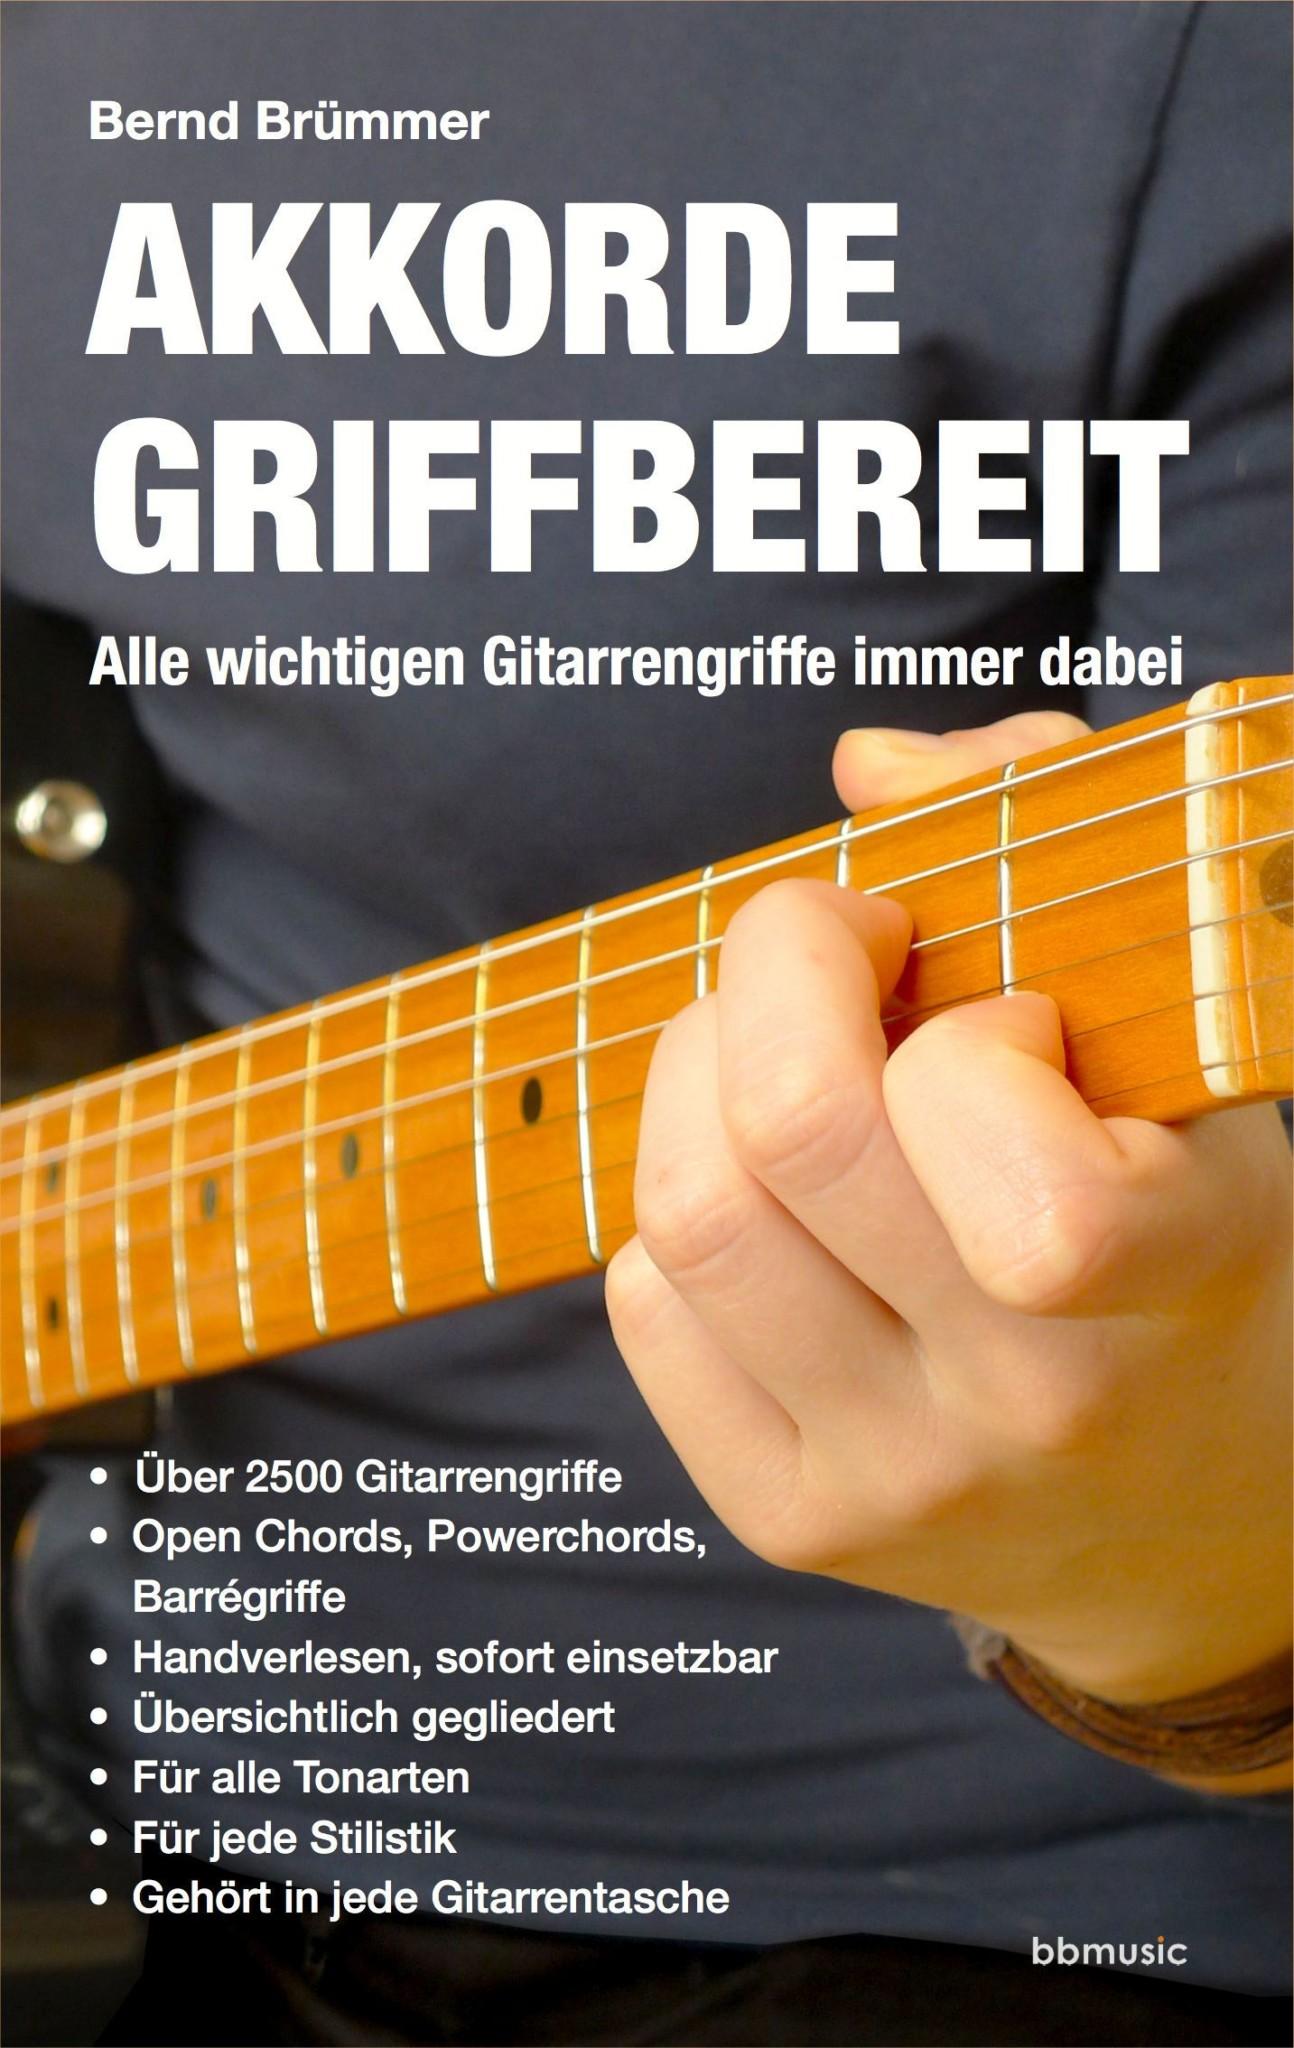 Akkorde griffbereit - Alle wichtigen Gitarrengriffe